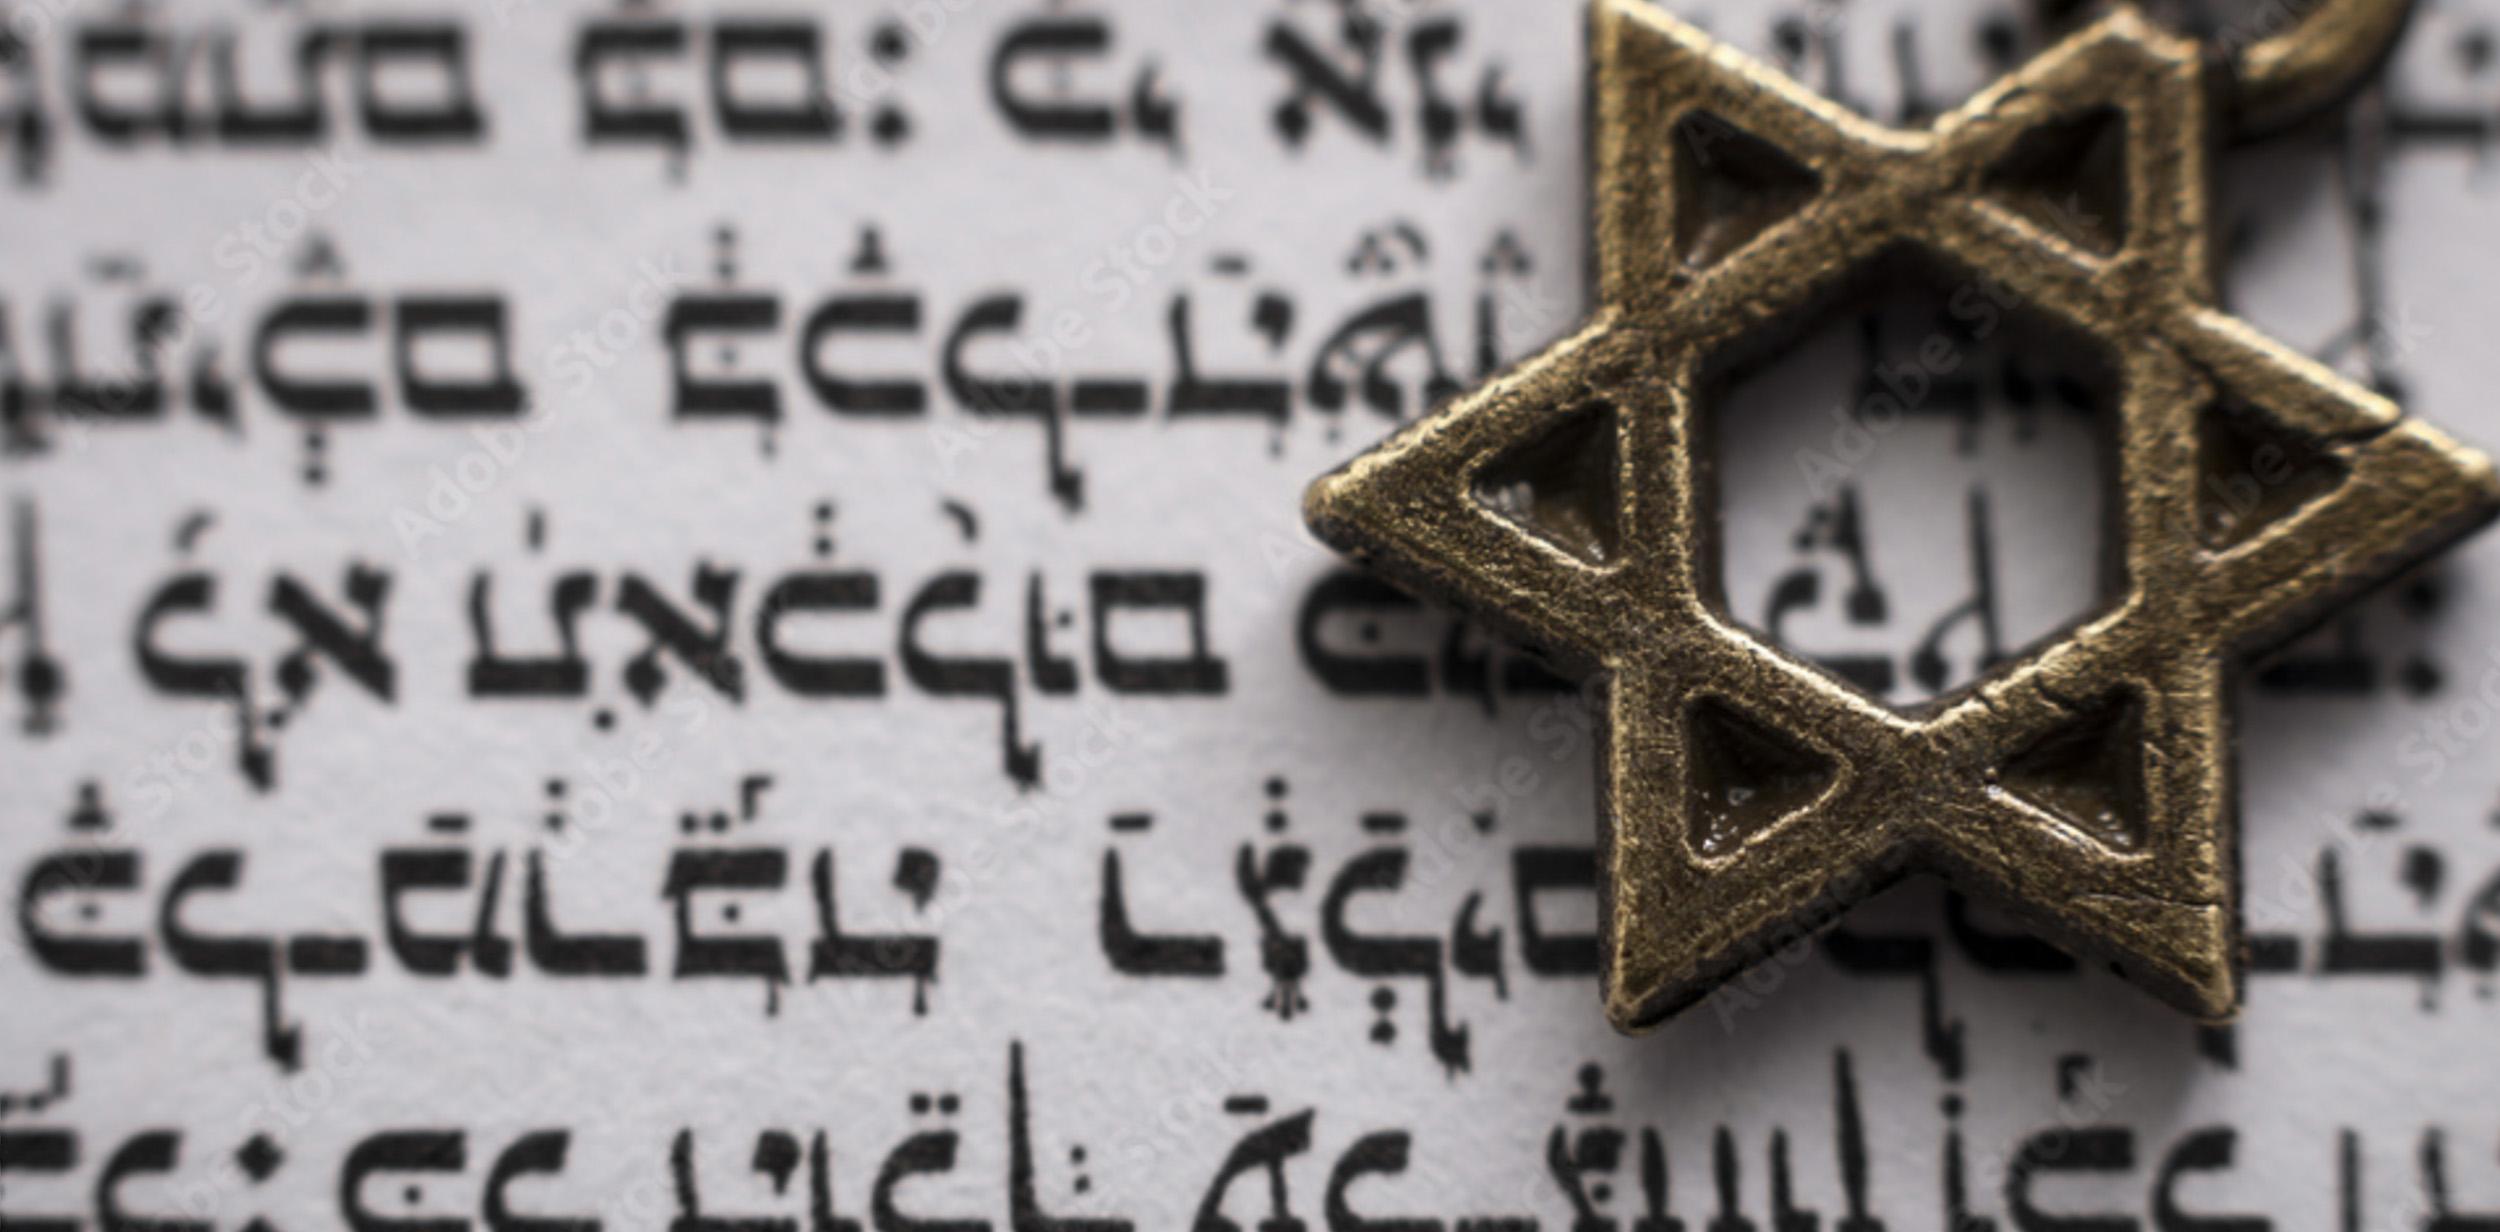 Messianic Believers in Israel Celebrate